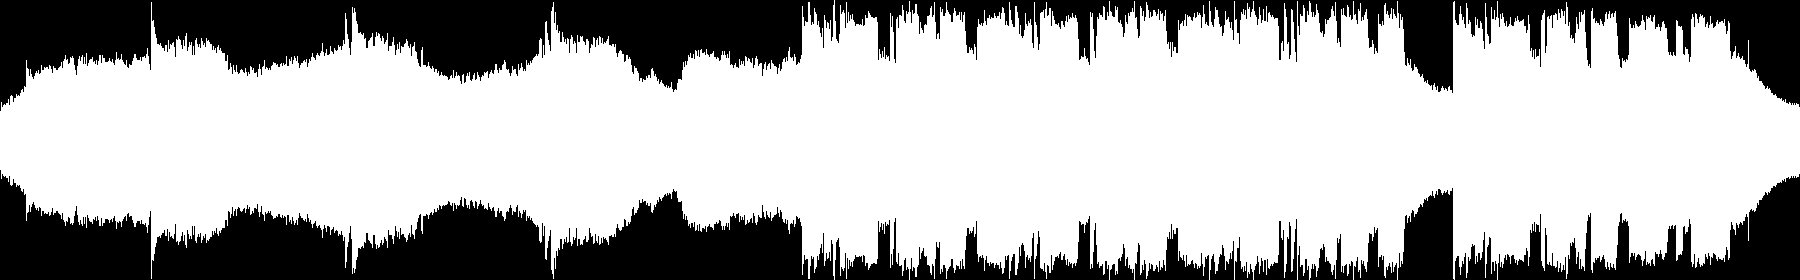 Persian Orchestra audio waveform